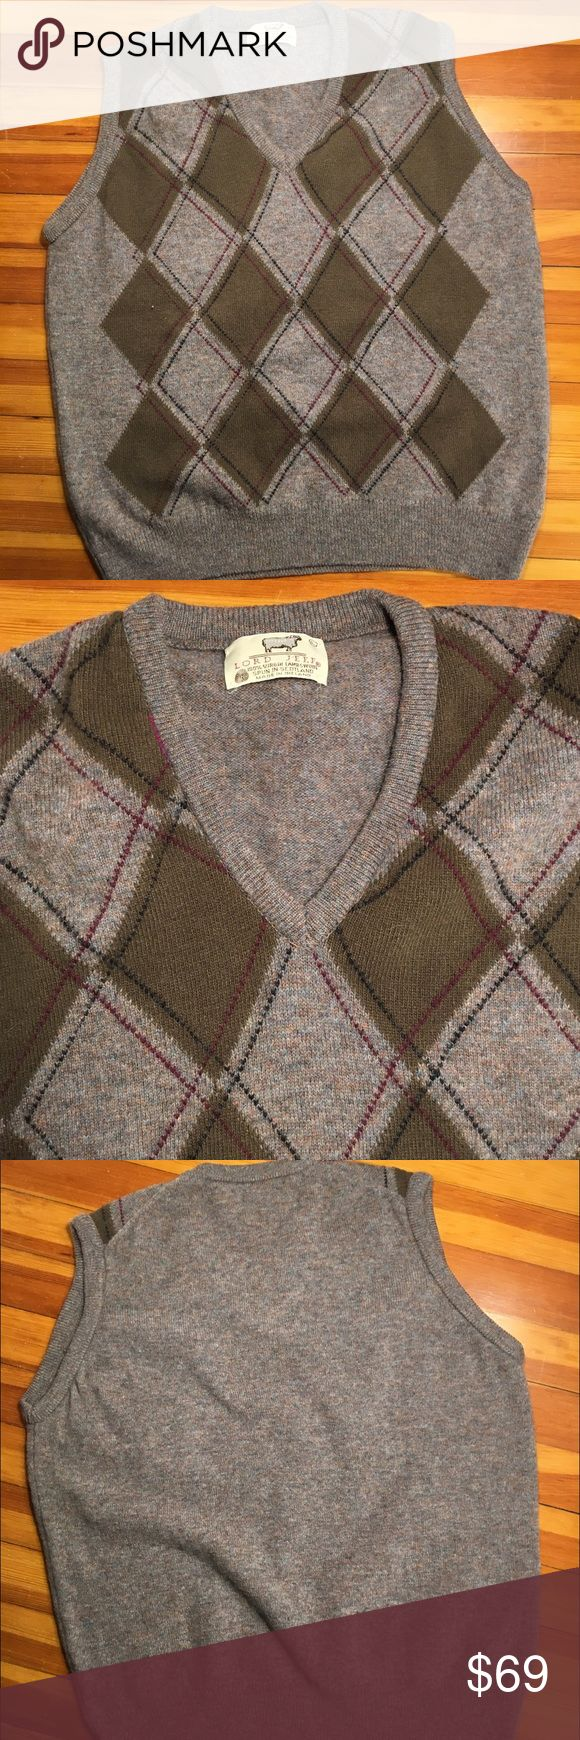 Lord Jeff 100% Virgin Lambswool Sweater Vest Vintage Men's Large Lord Jeff 100% Virgin Lambswool Argyle Sweater Vest in like new condition. Lord Jeff Sweaters V-Neck